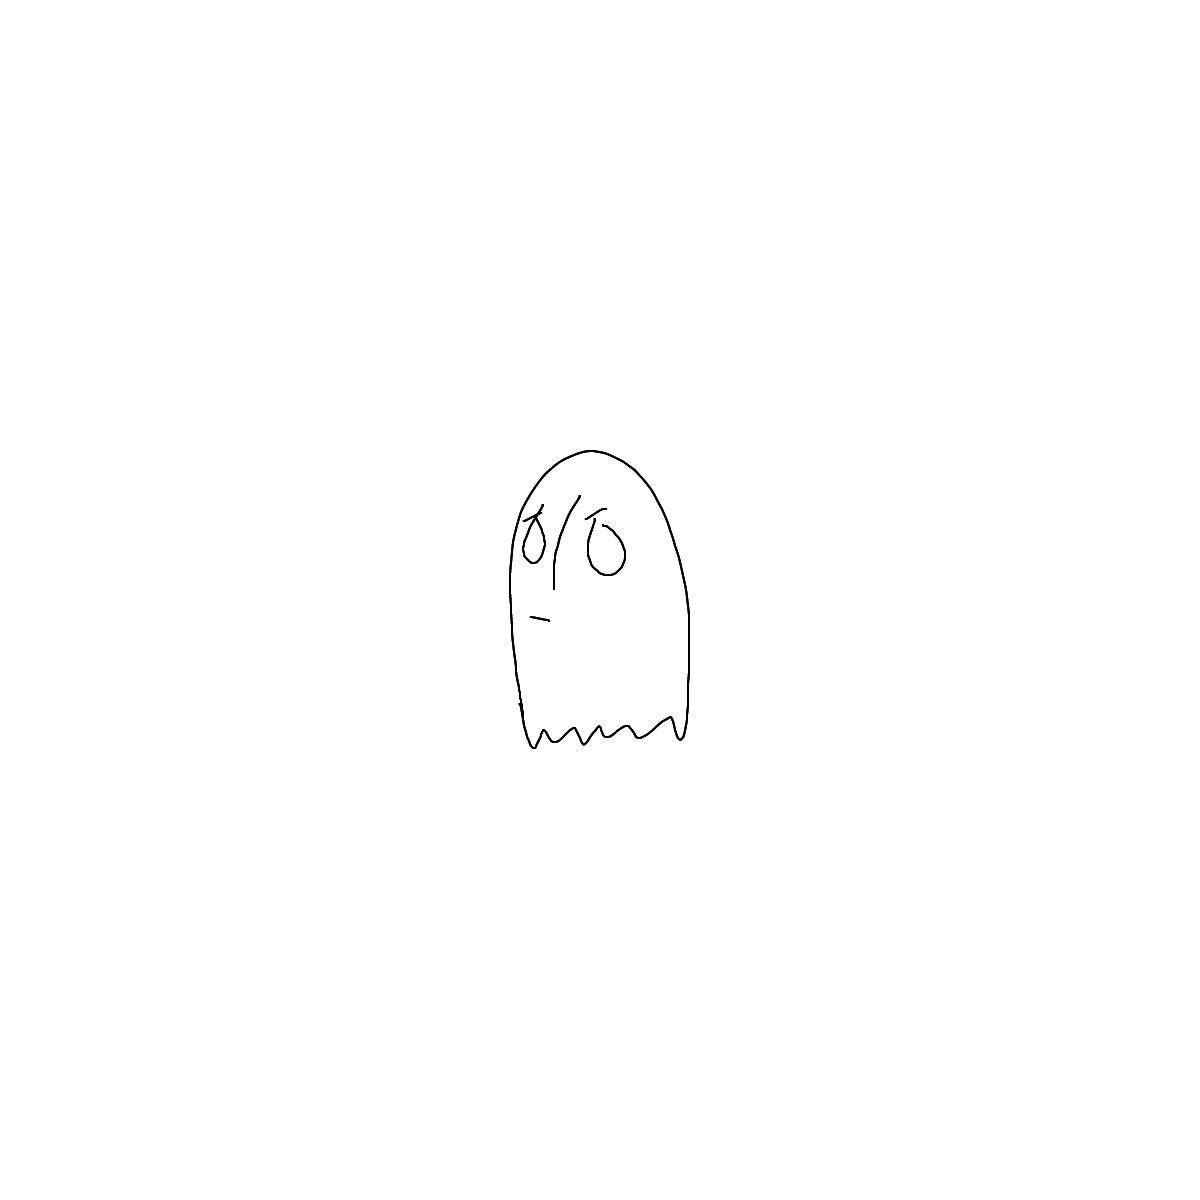 BAAAM drawing#23477 lat:52.4758071899414060lng: 13.4069852828979500